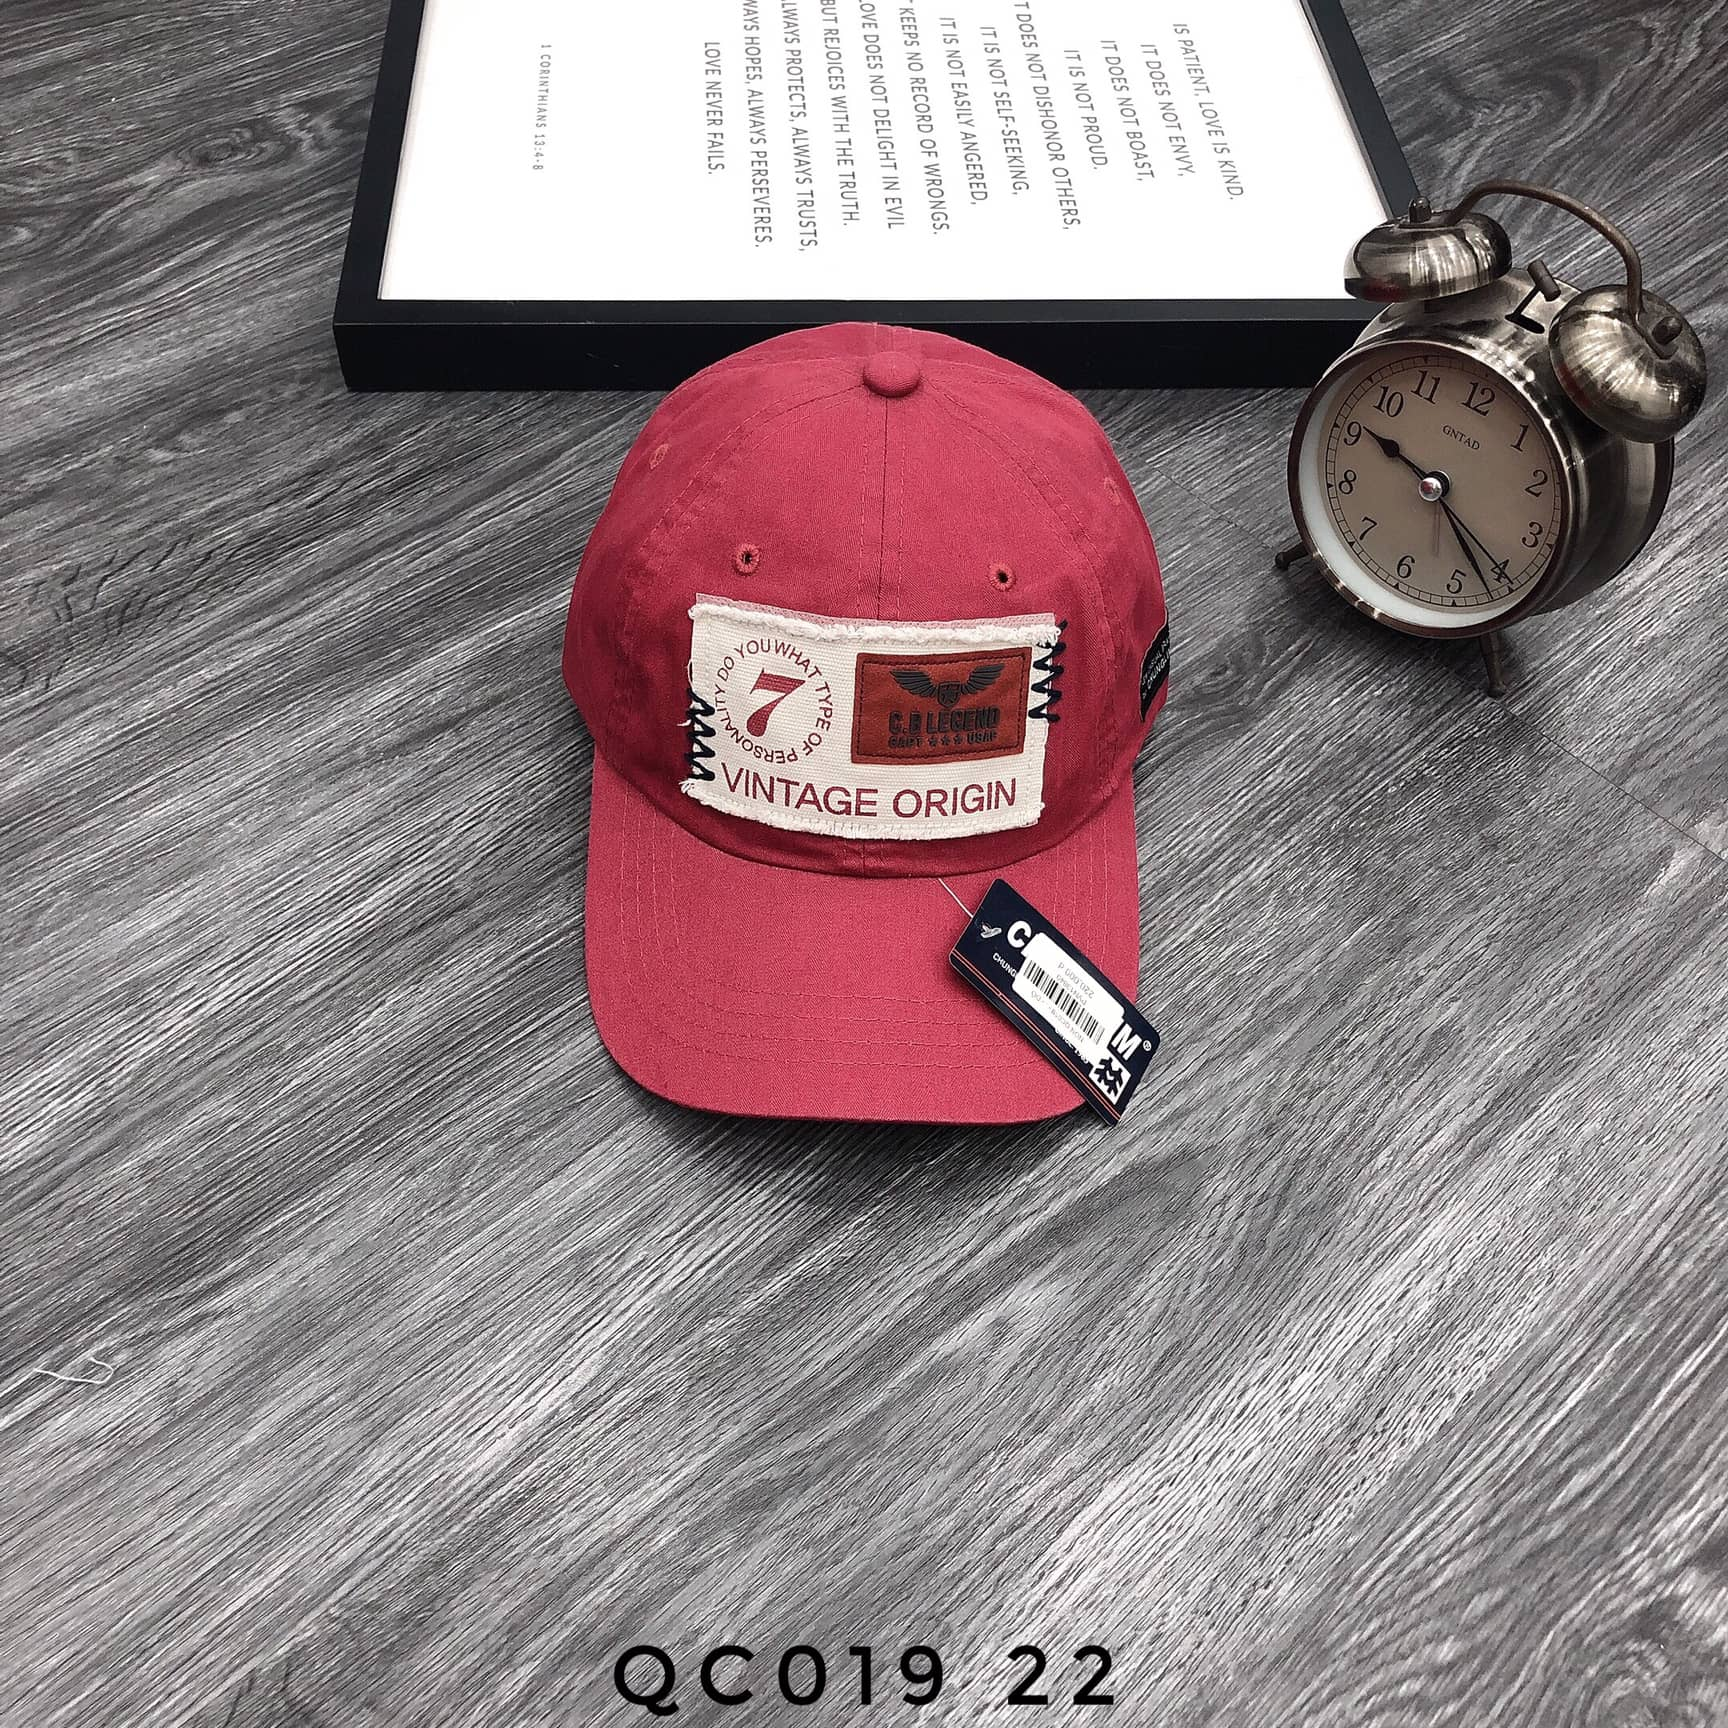 NÓN QC019